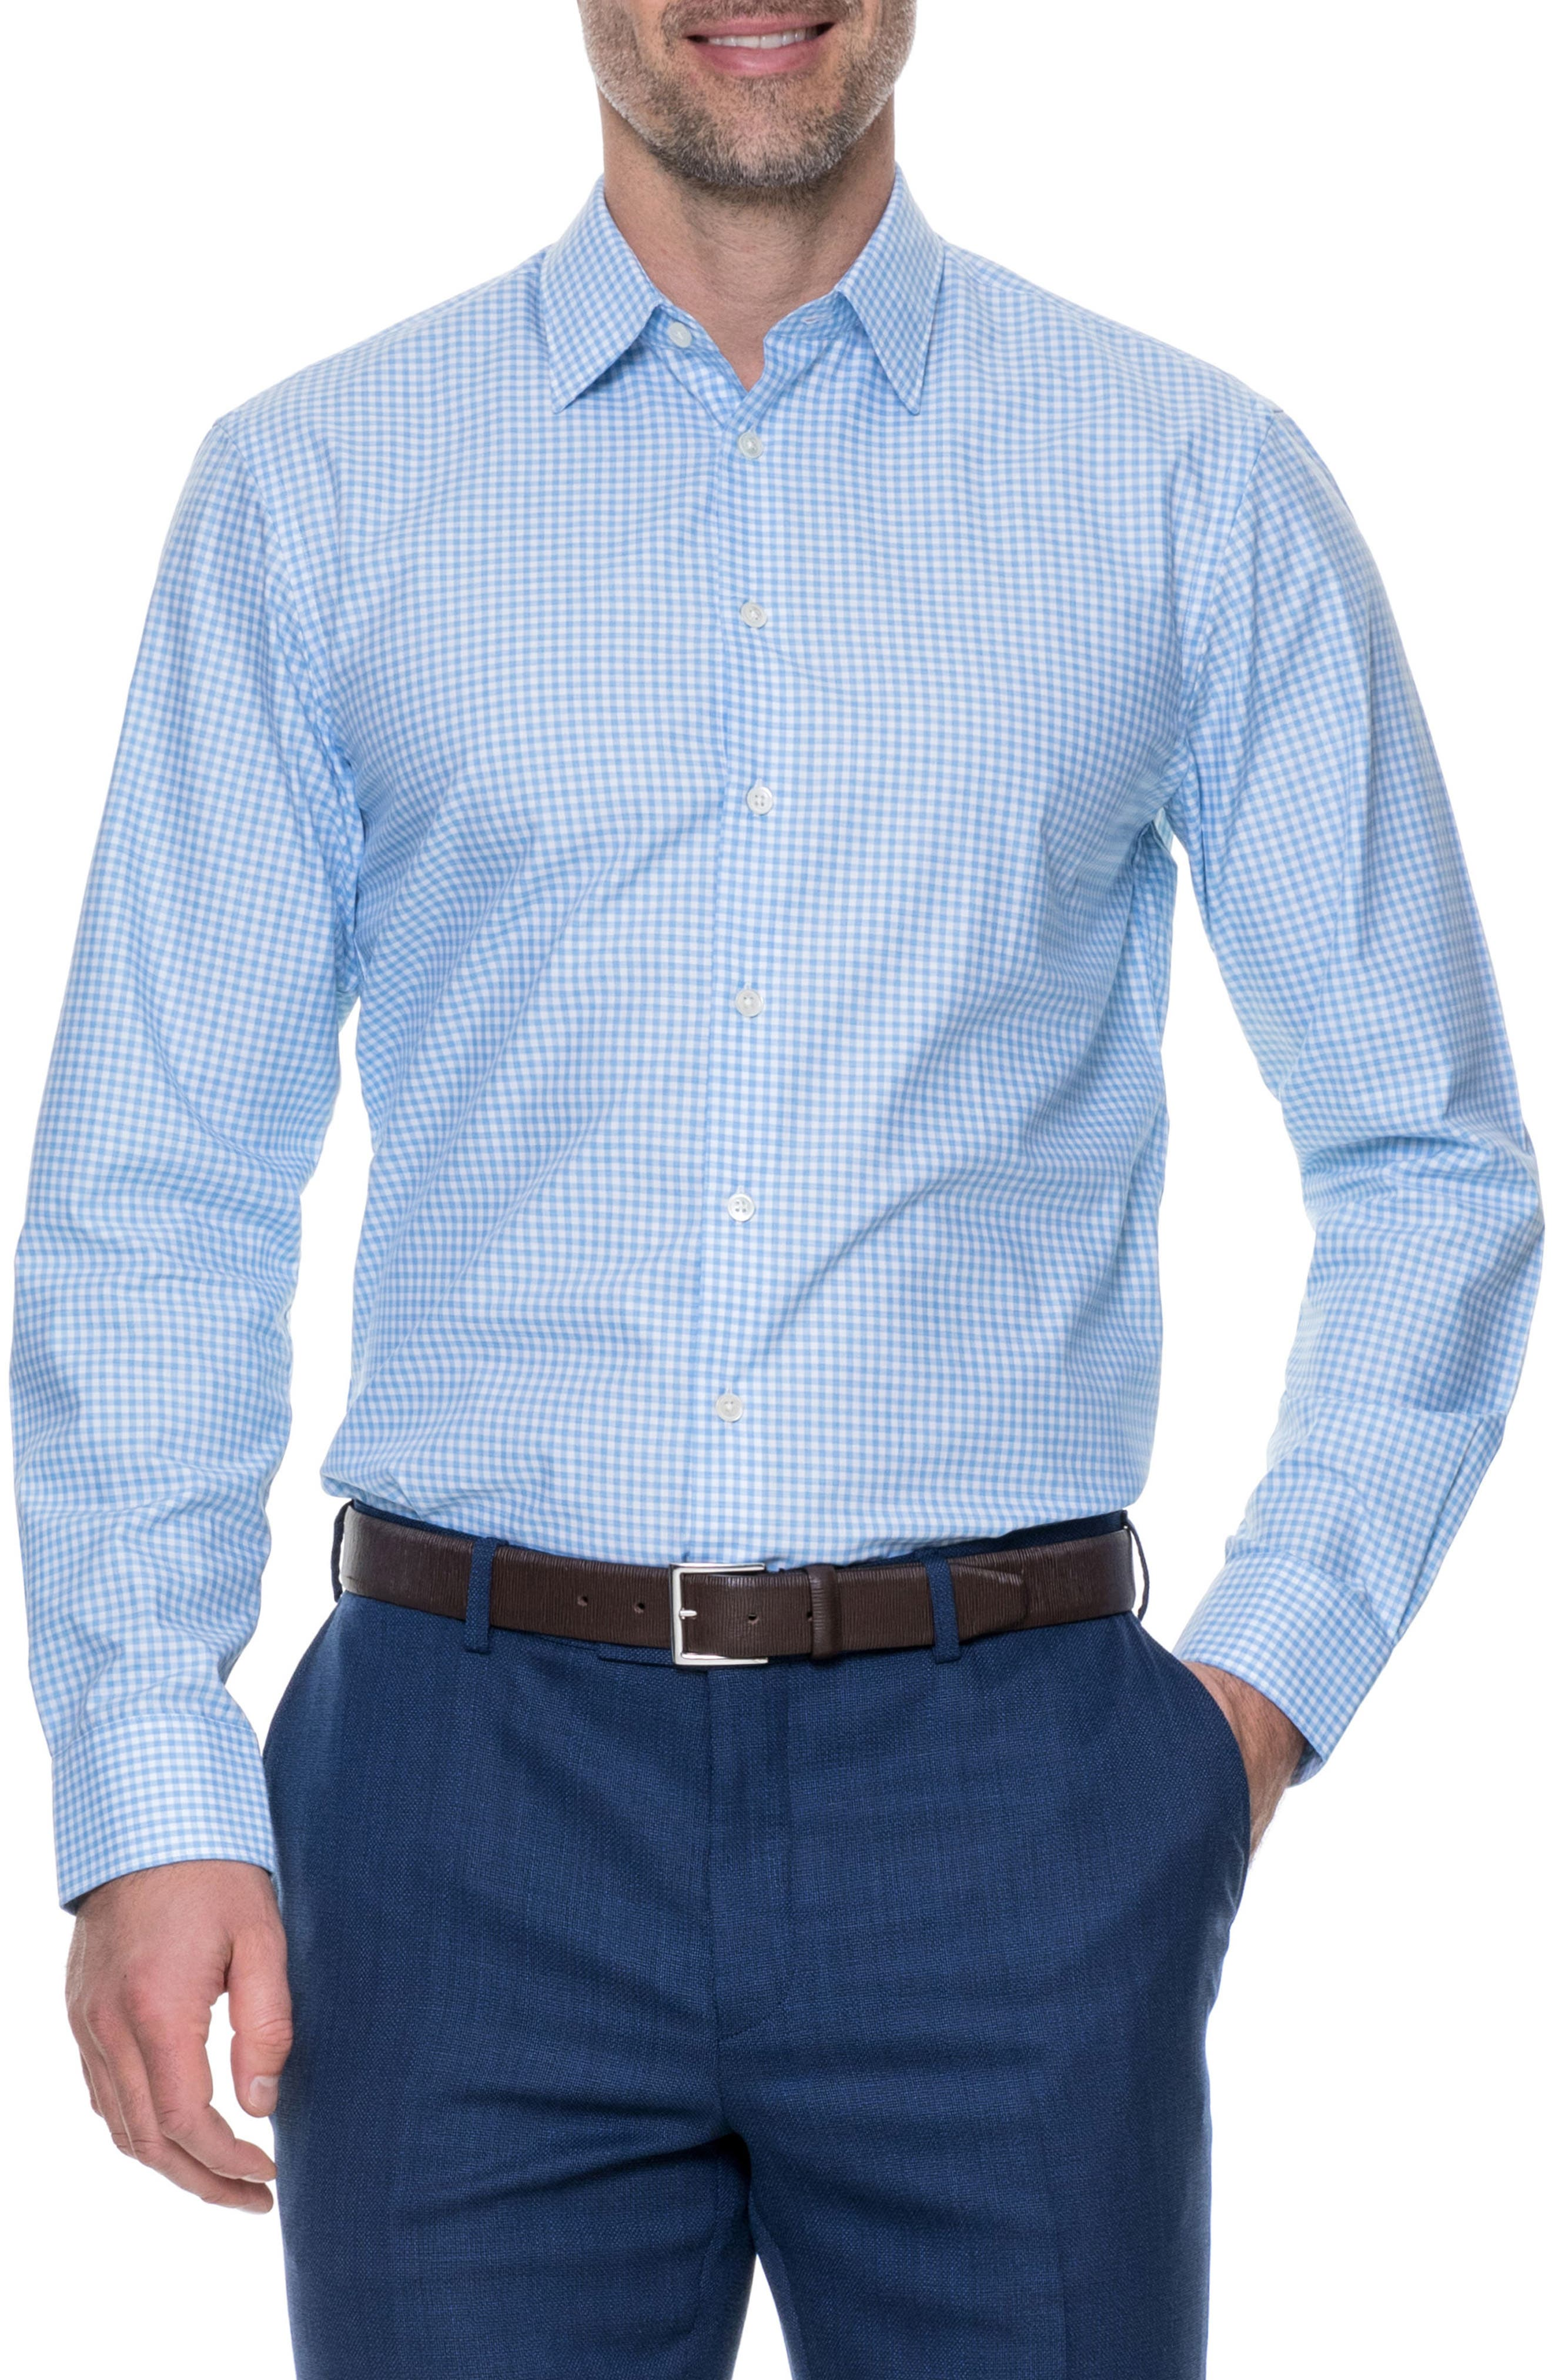 Tudor Slim Fit Check Sport Shirt,                             Main thumbnail 1, color,                             456